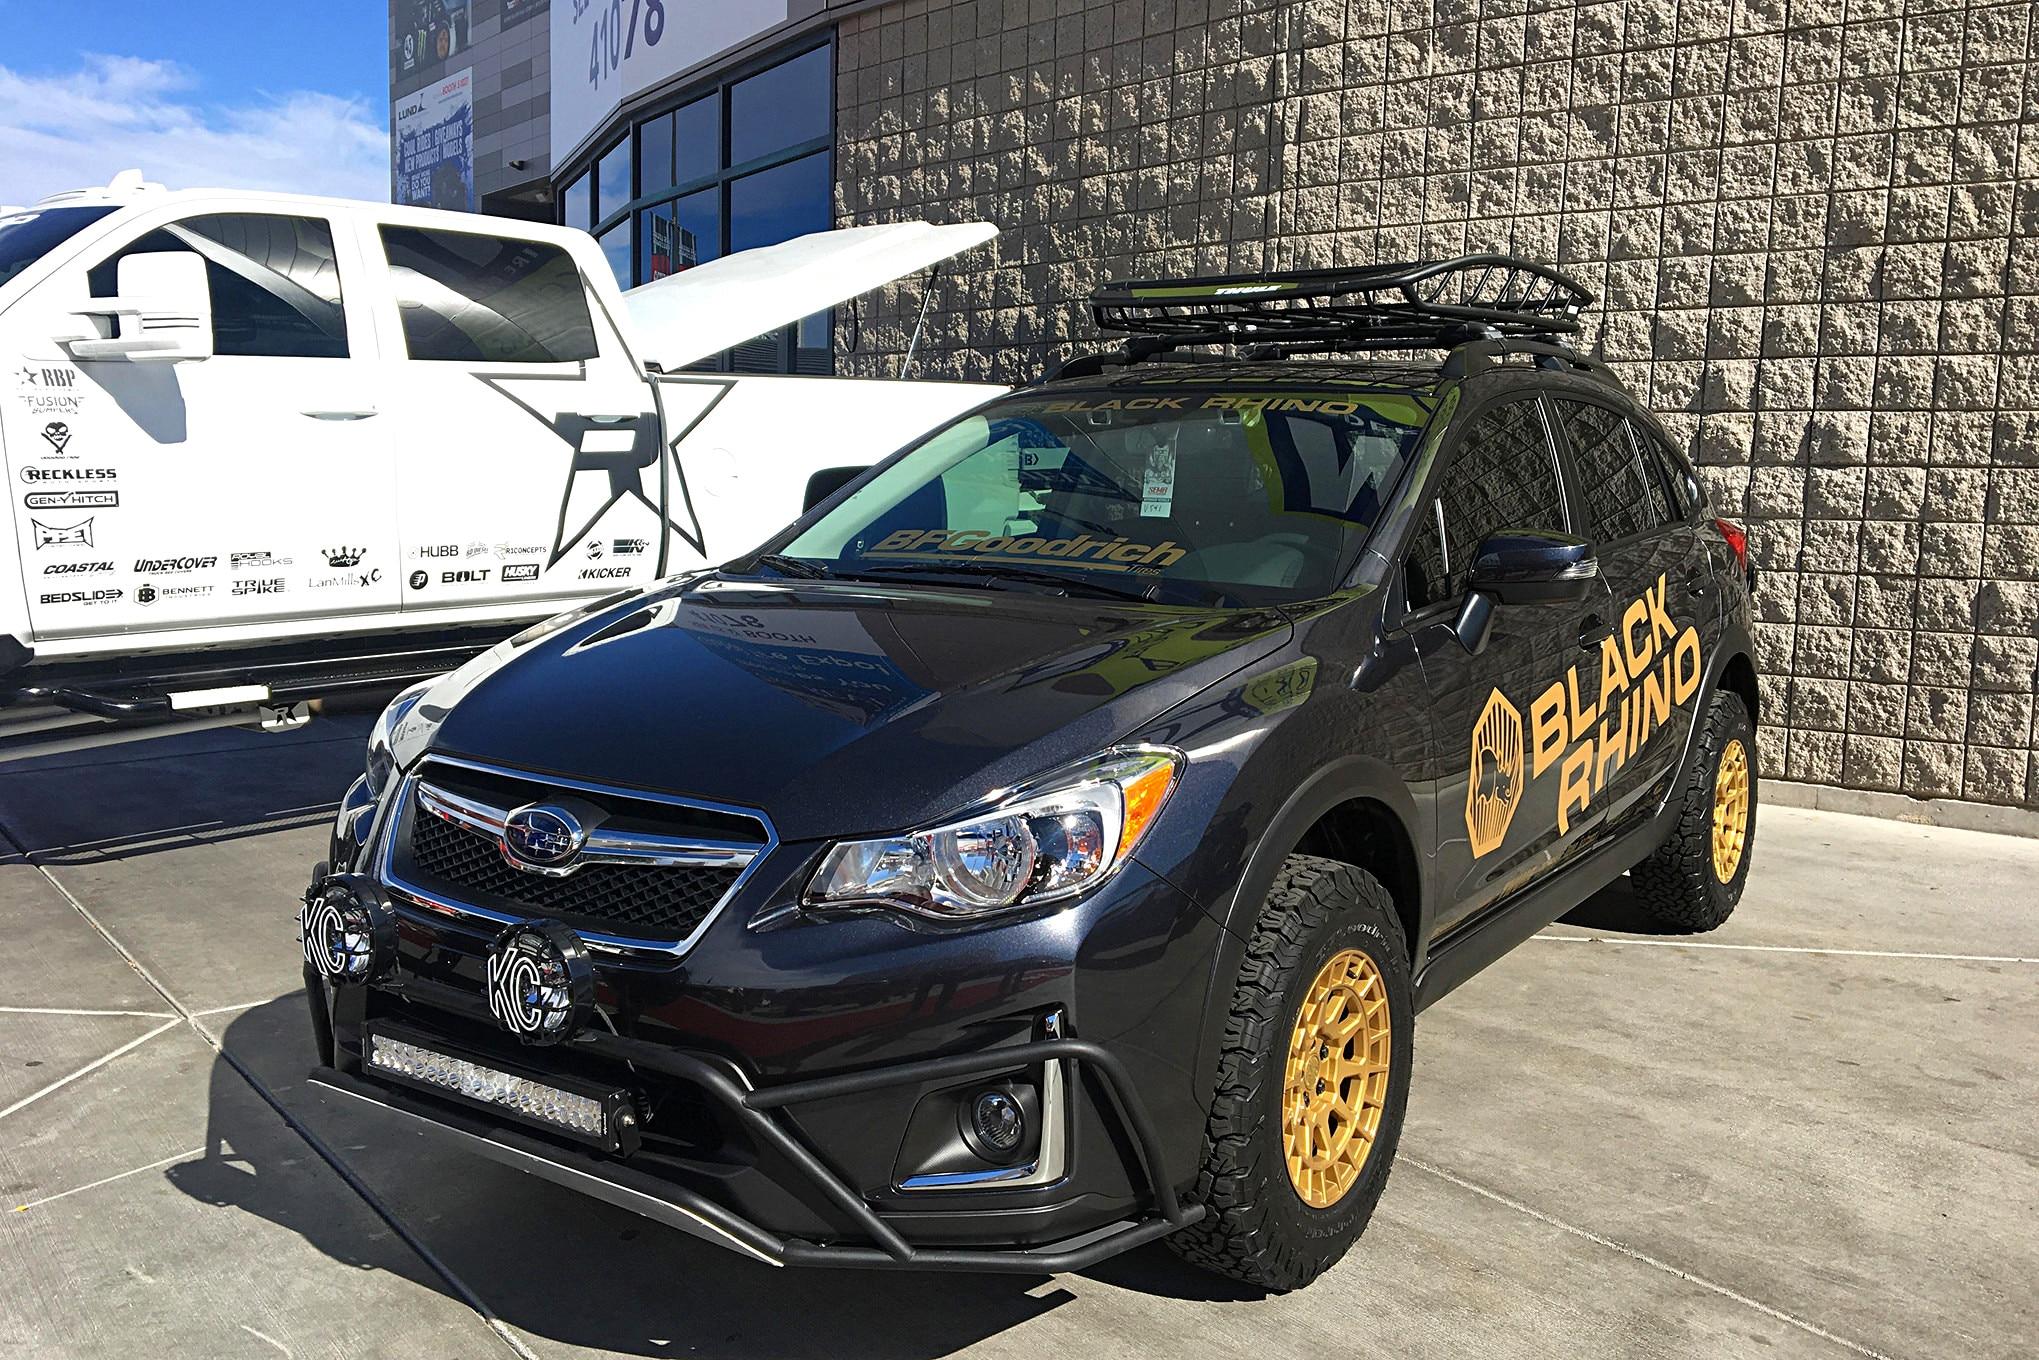 sema 2017 unusual off road vehicles 13